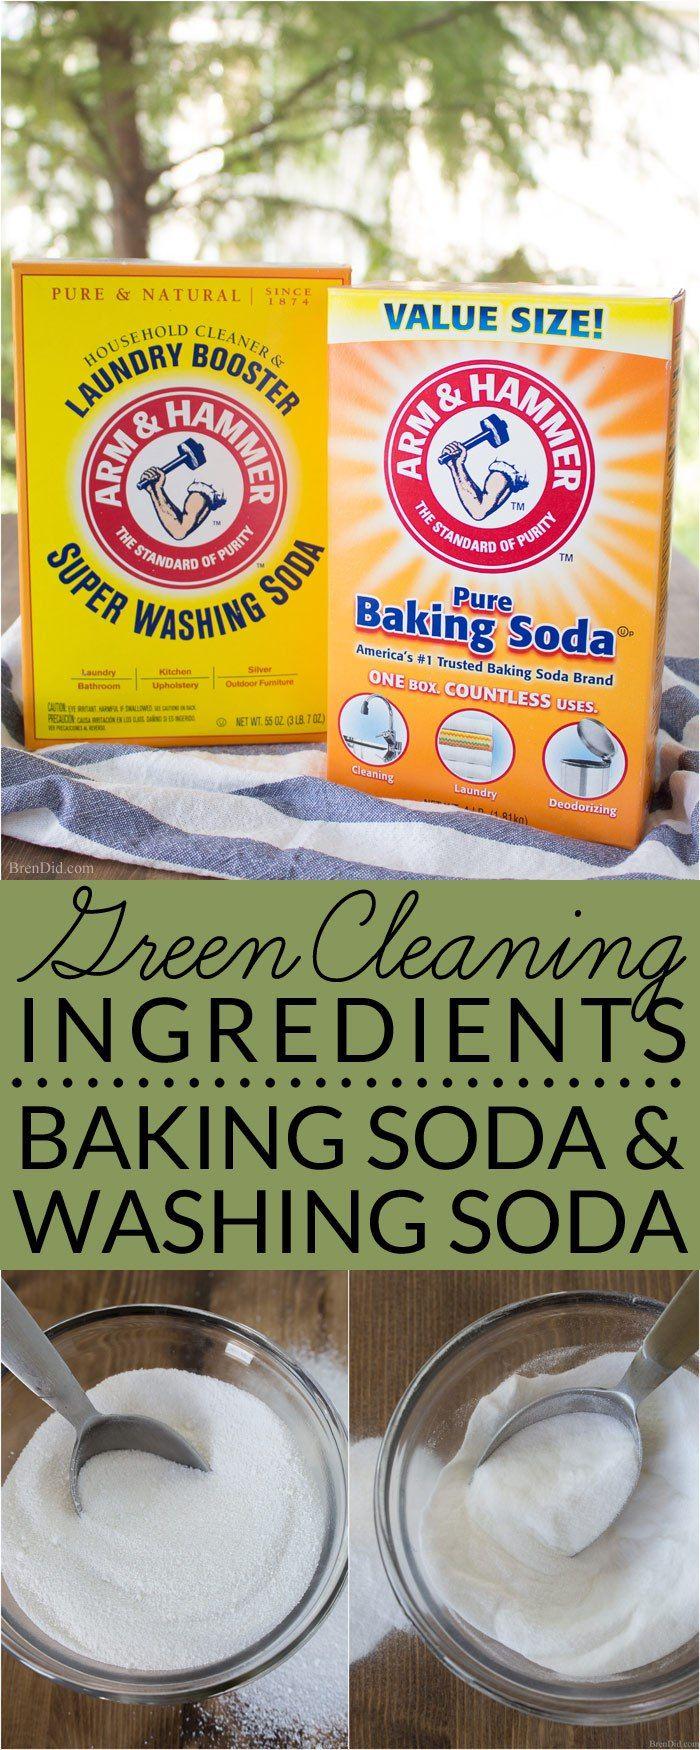 Baking Soda and Washing Soda sound similar but they are definitely not the same…